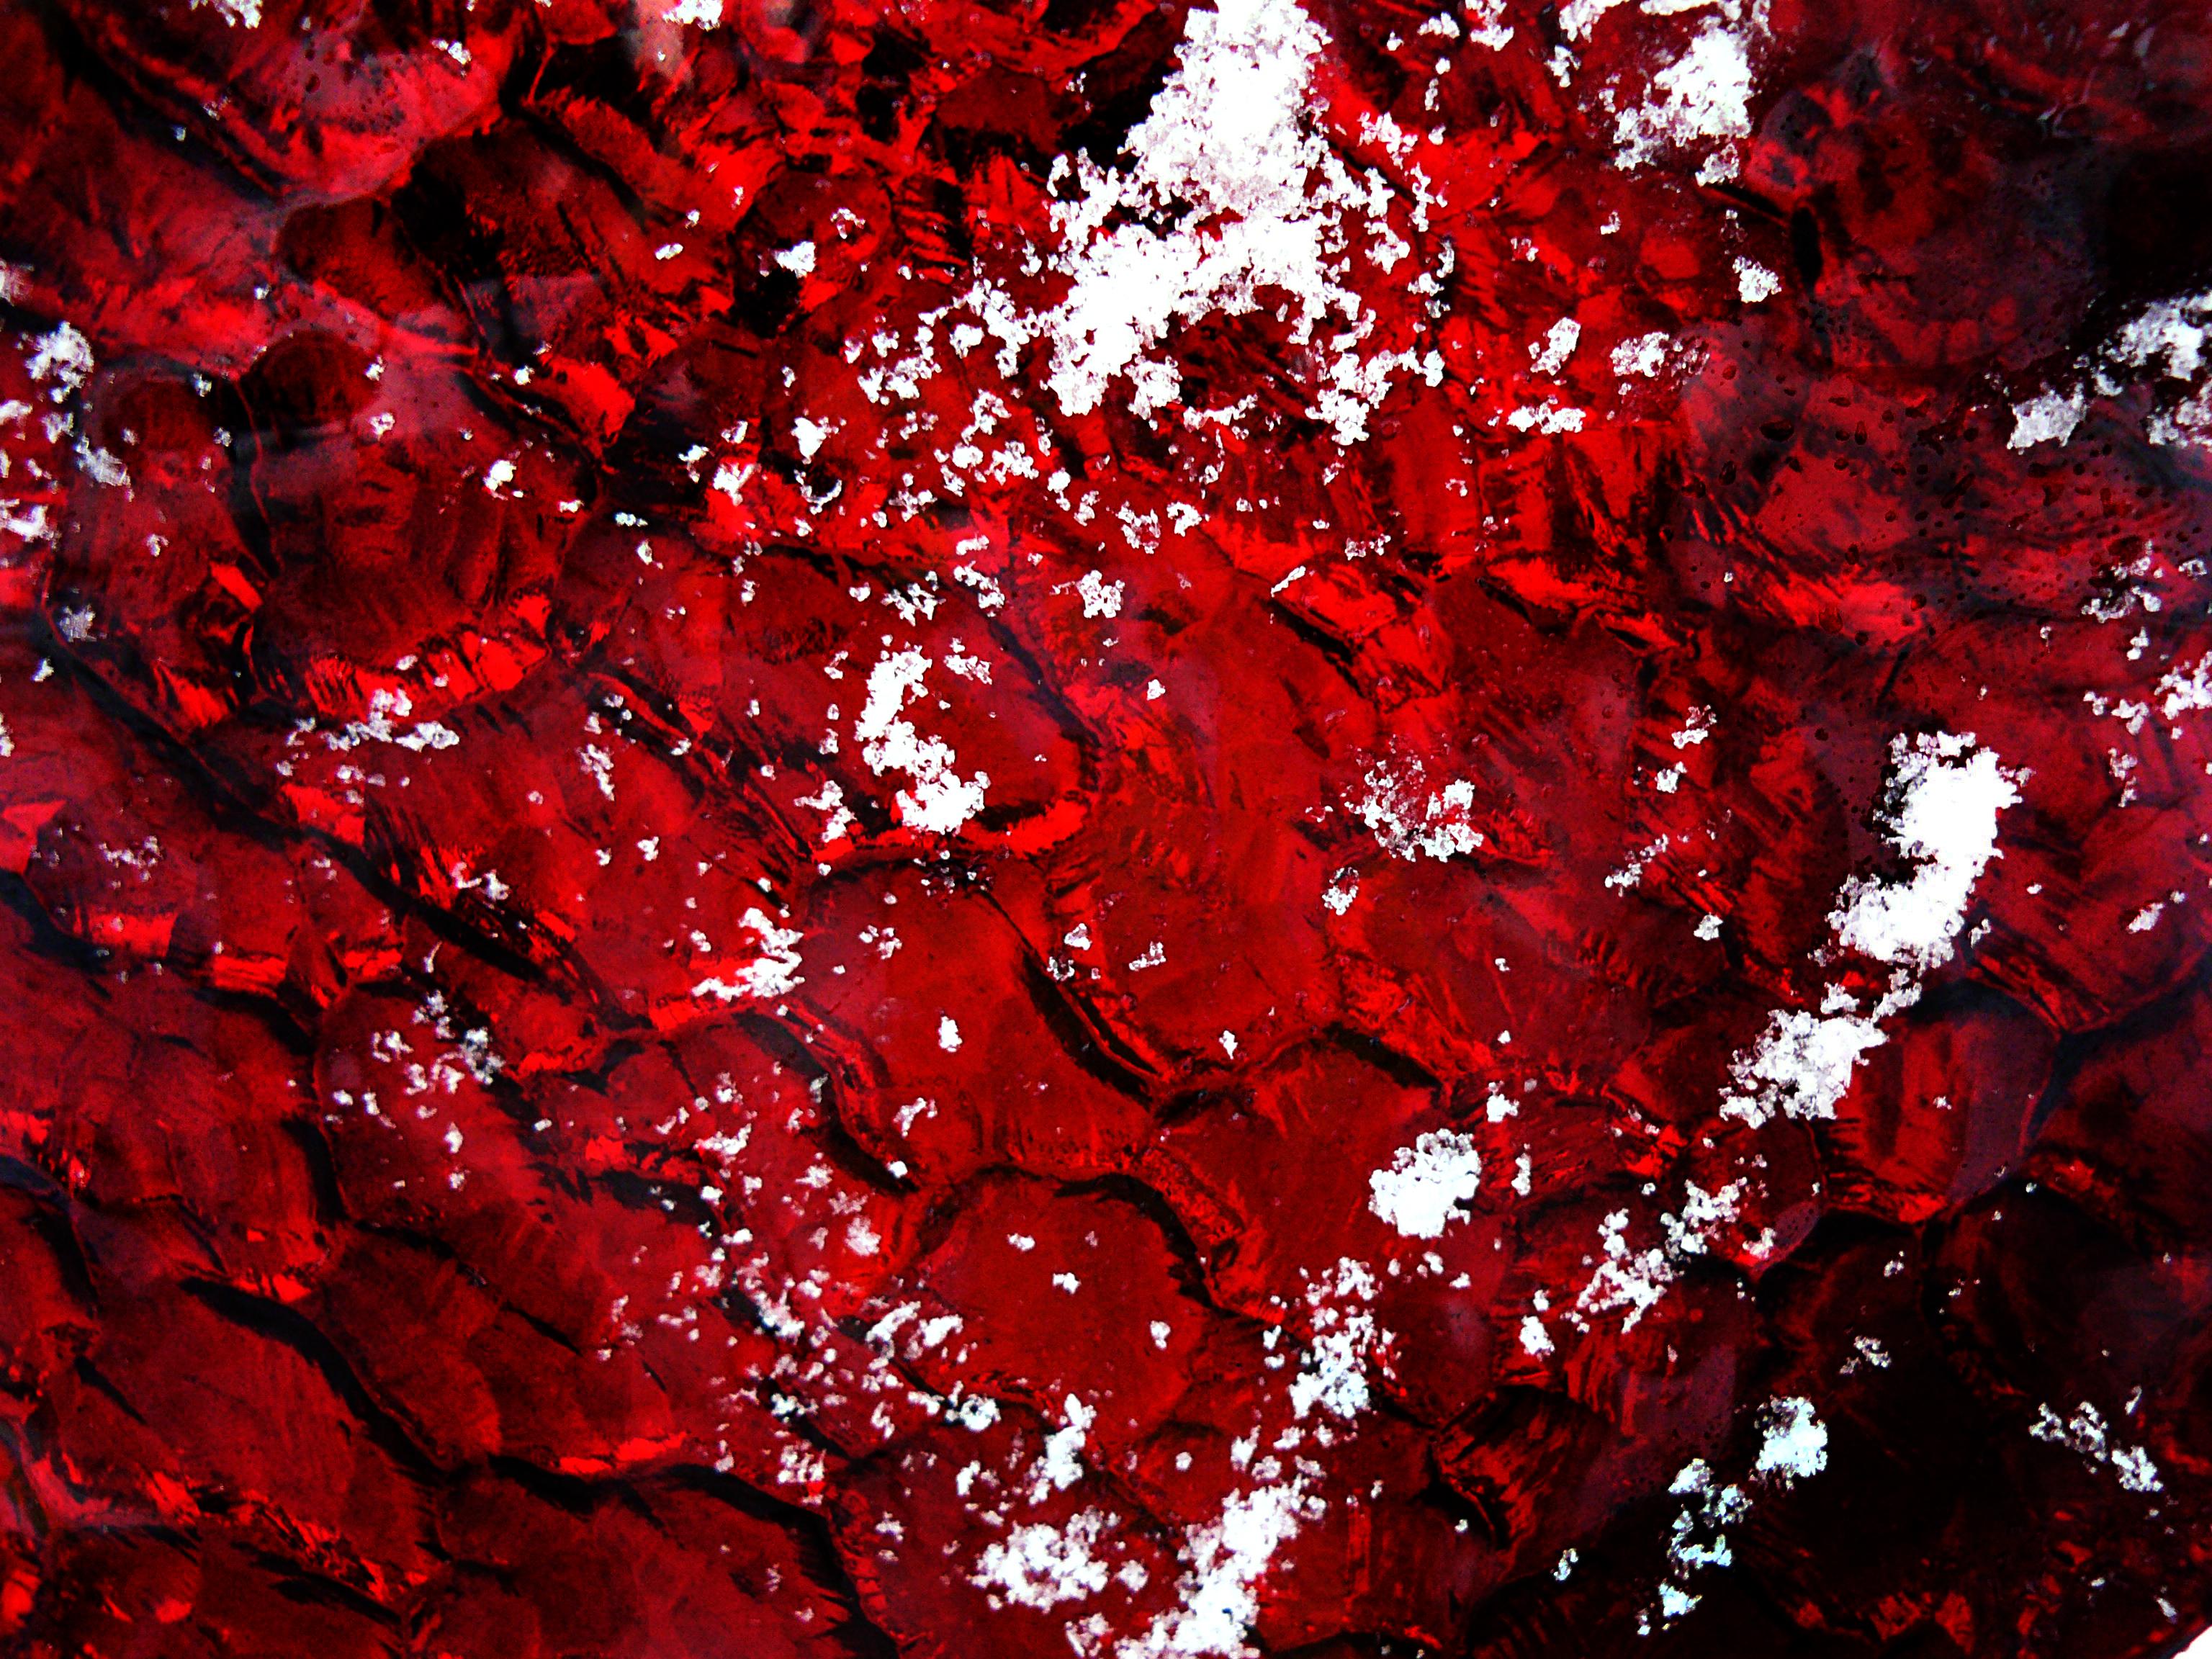 Red Glass By Letinhastock On DeviantArt